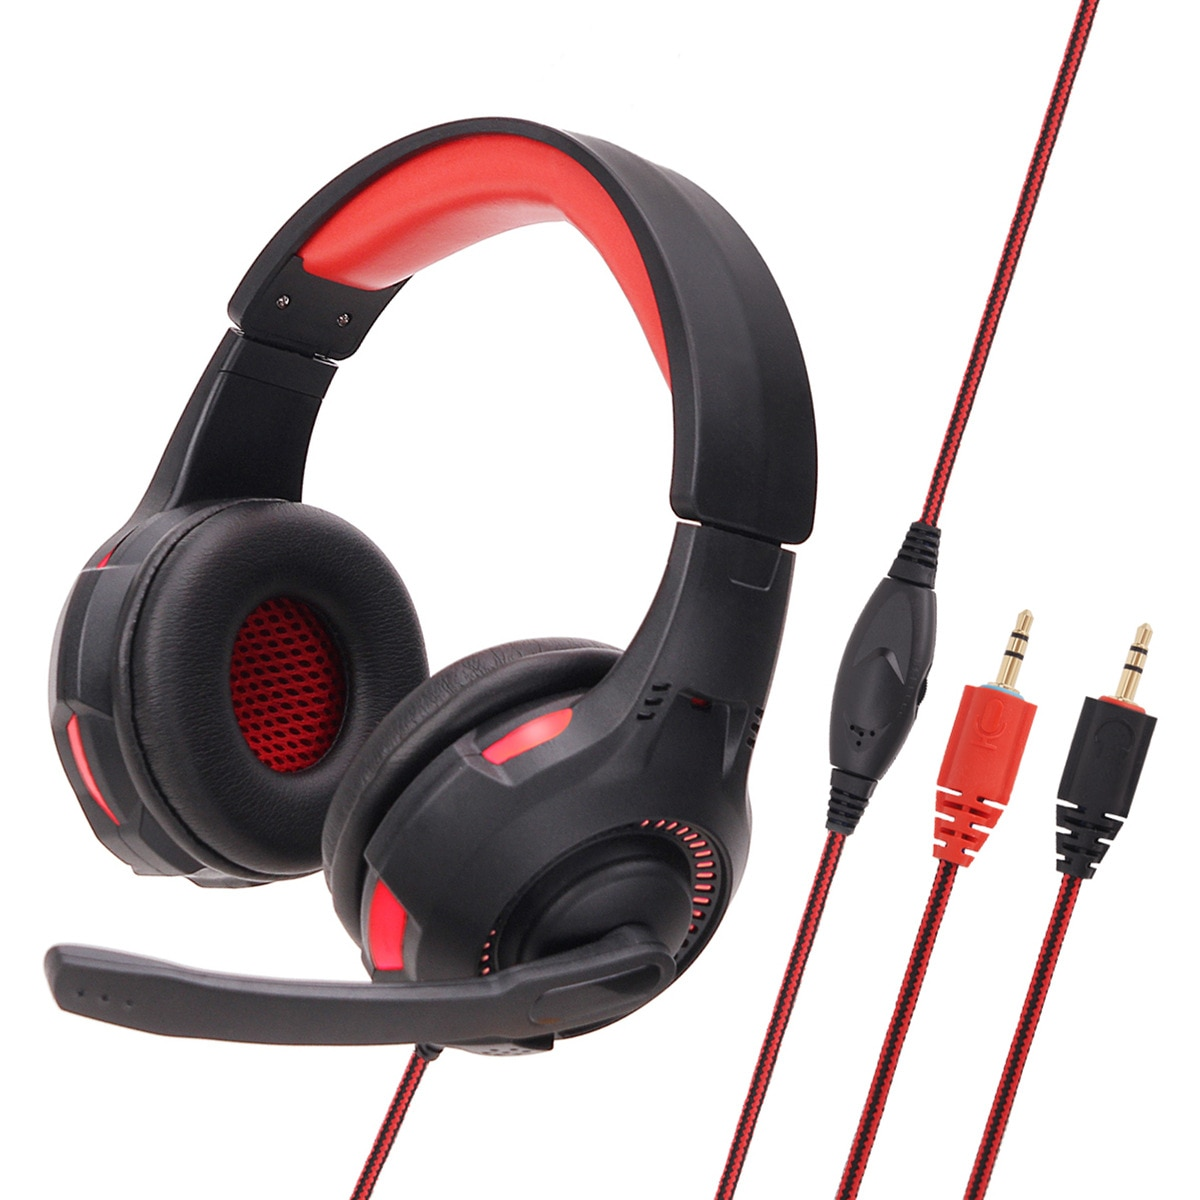 Soyto/luan yutong sy885mv luminoso jogo e-esportes fone de ouvido fone de ouvido internet cafe fone de ouvido